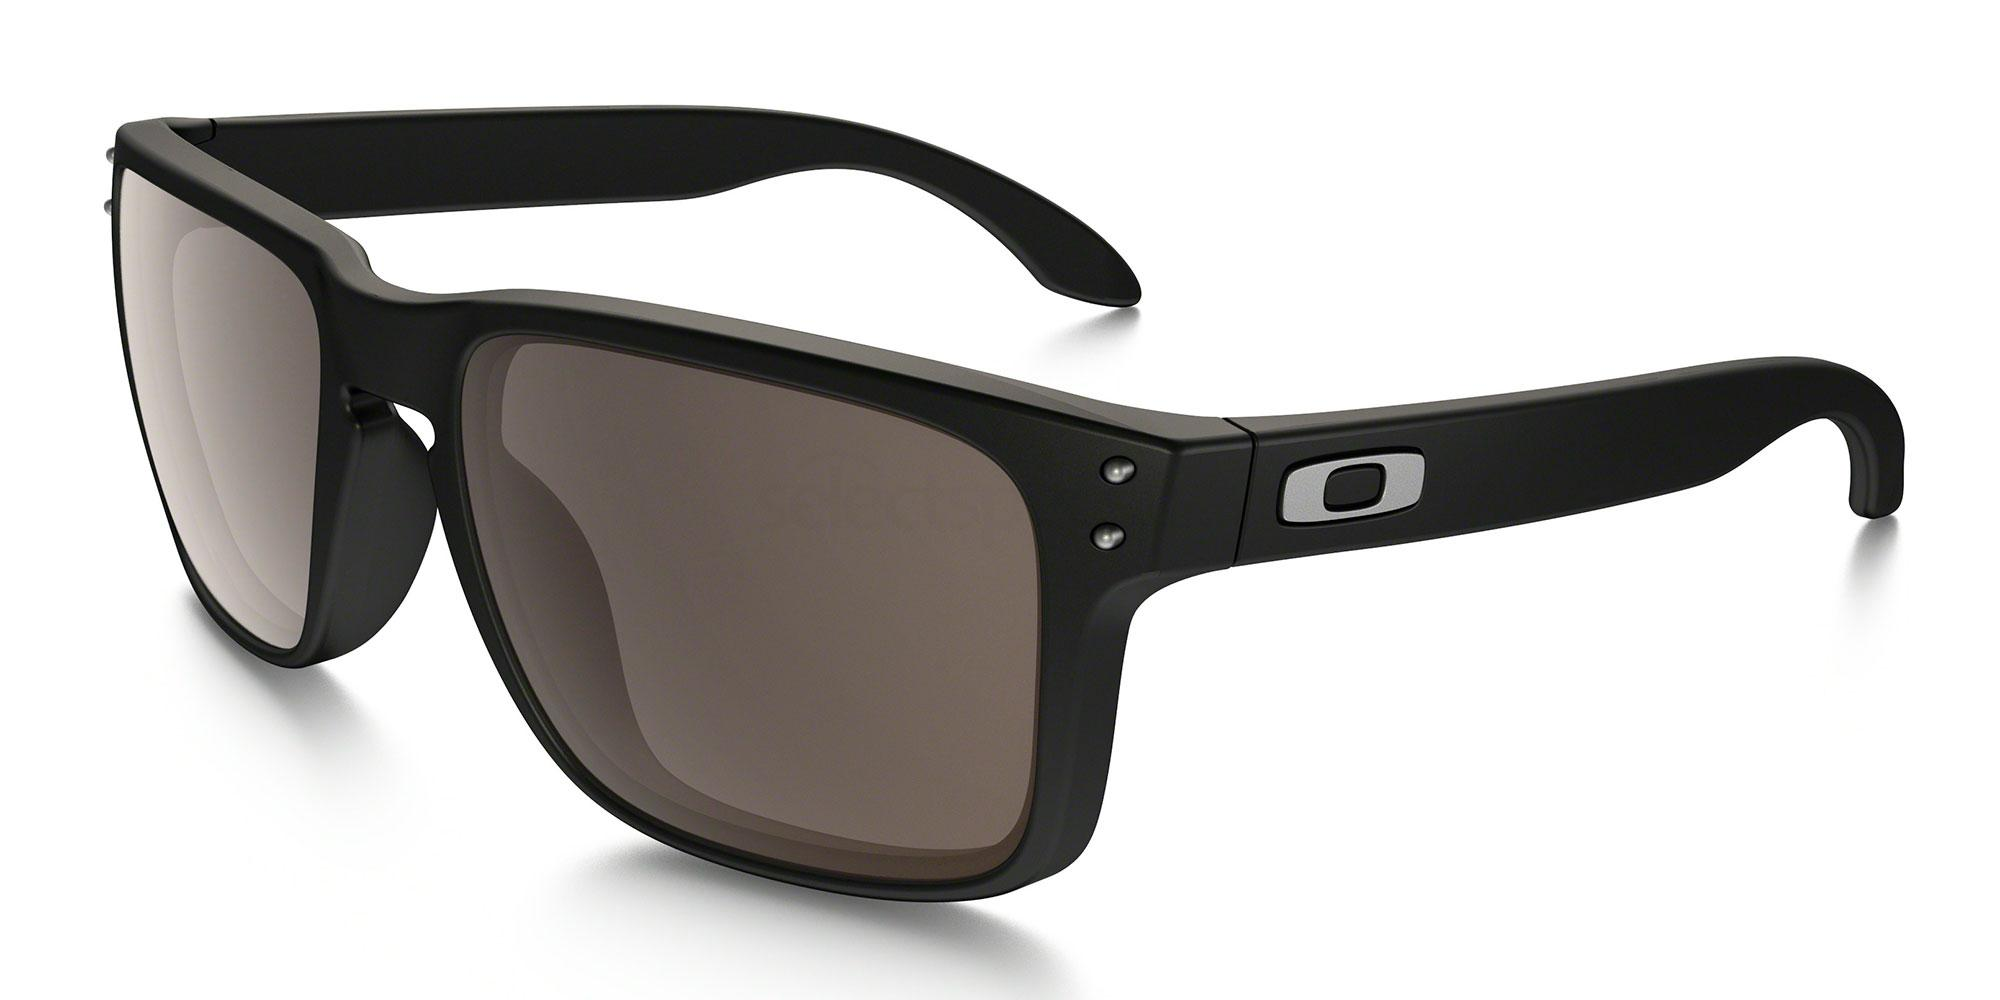 910201 OO9102 HOLBROOK (Standard) (1/3) Sunglasses, Oakley